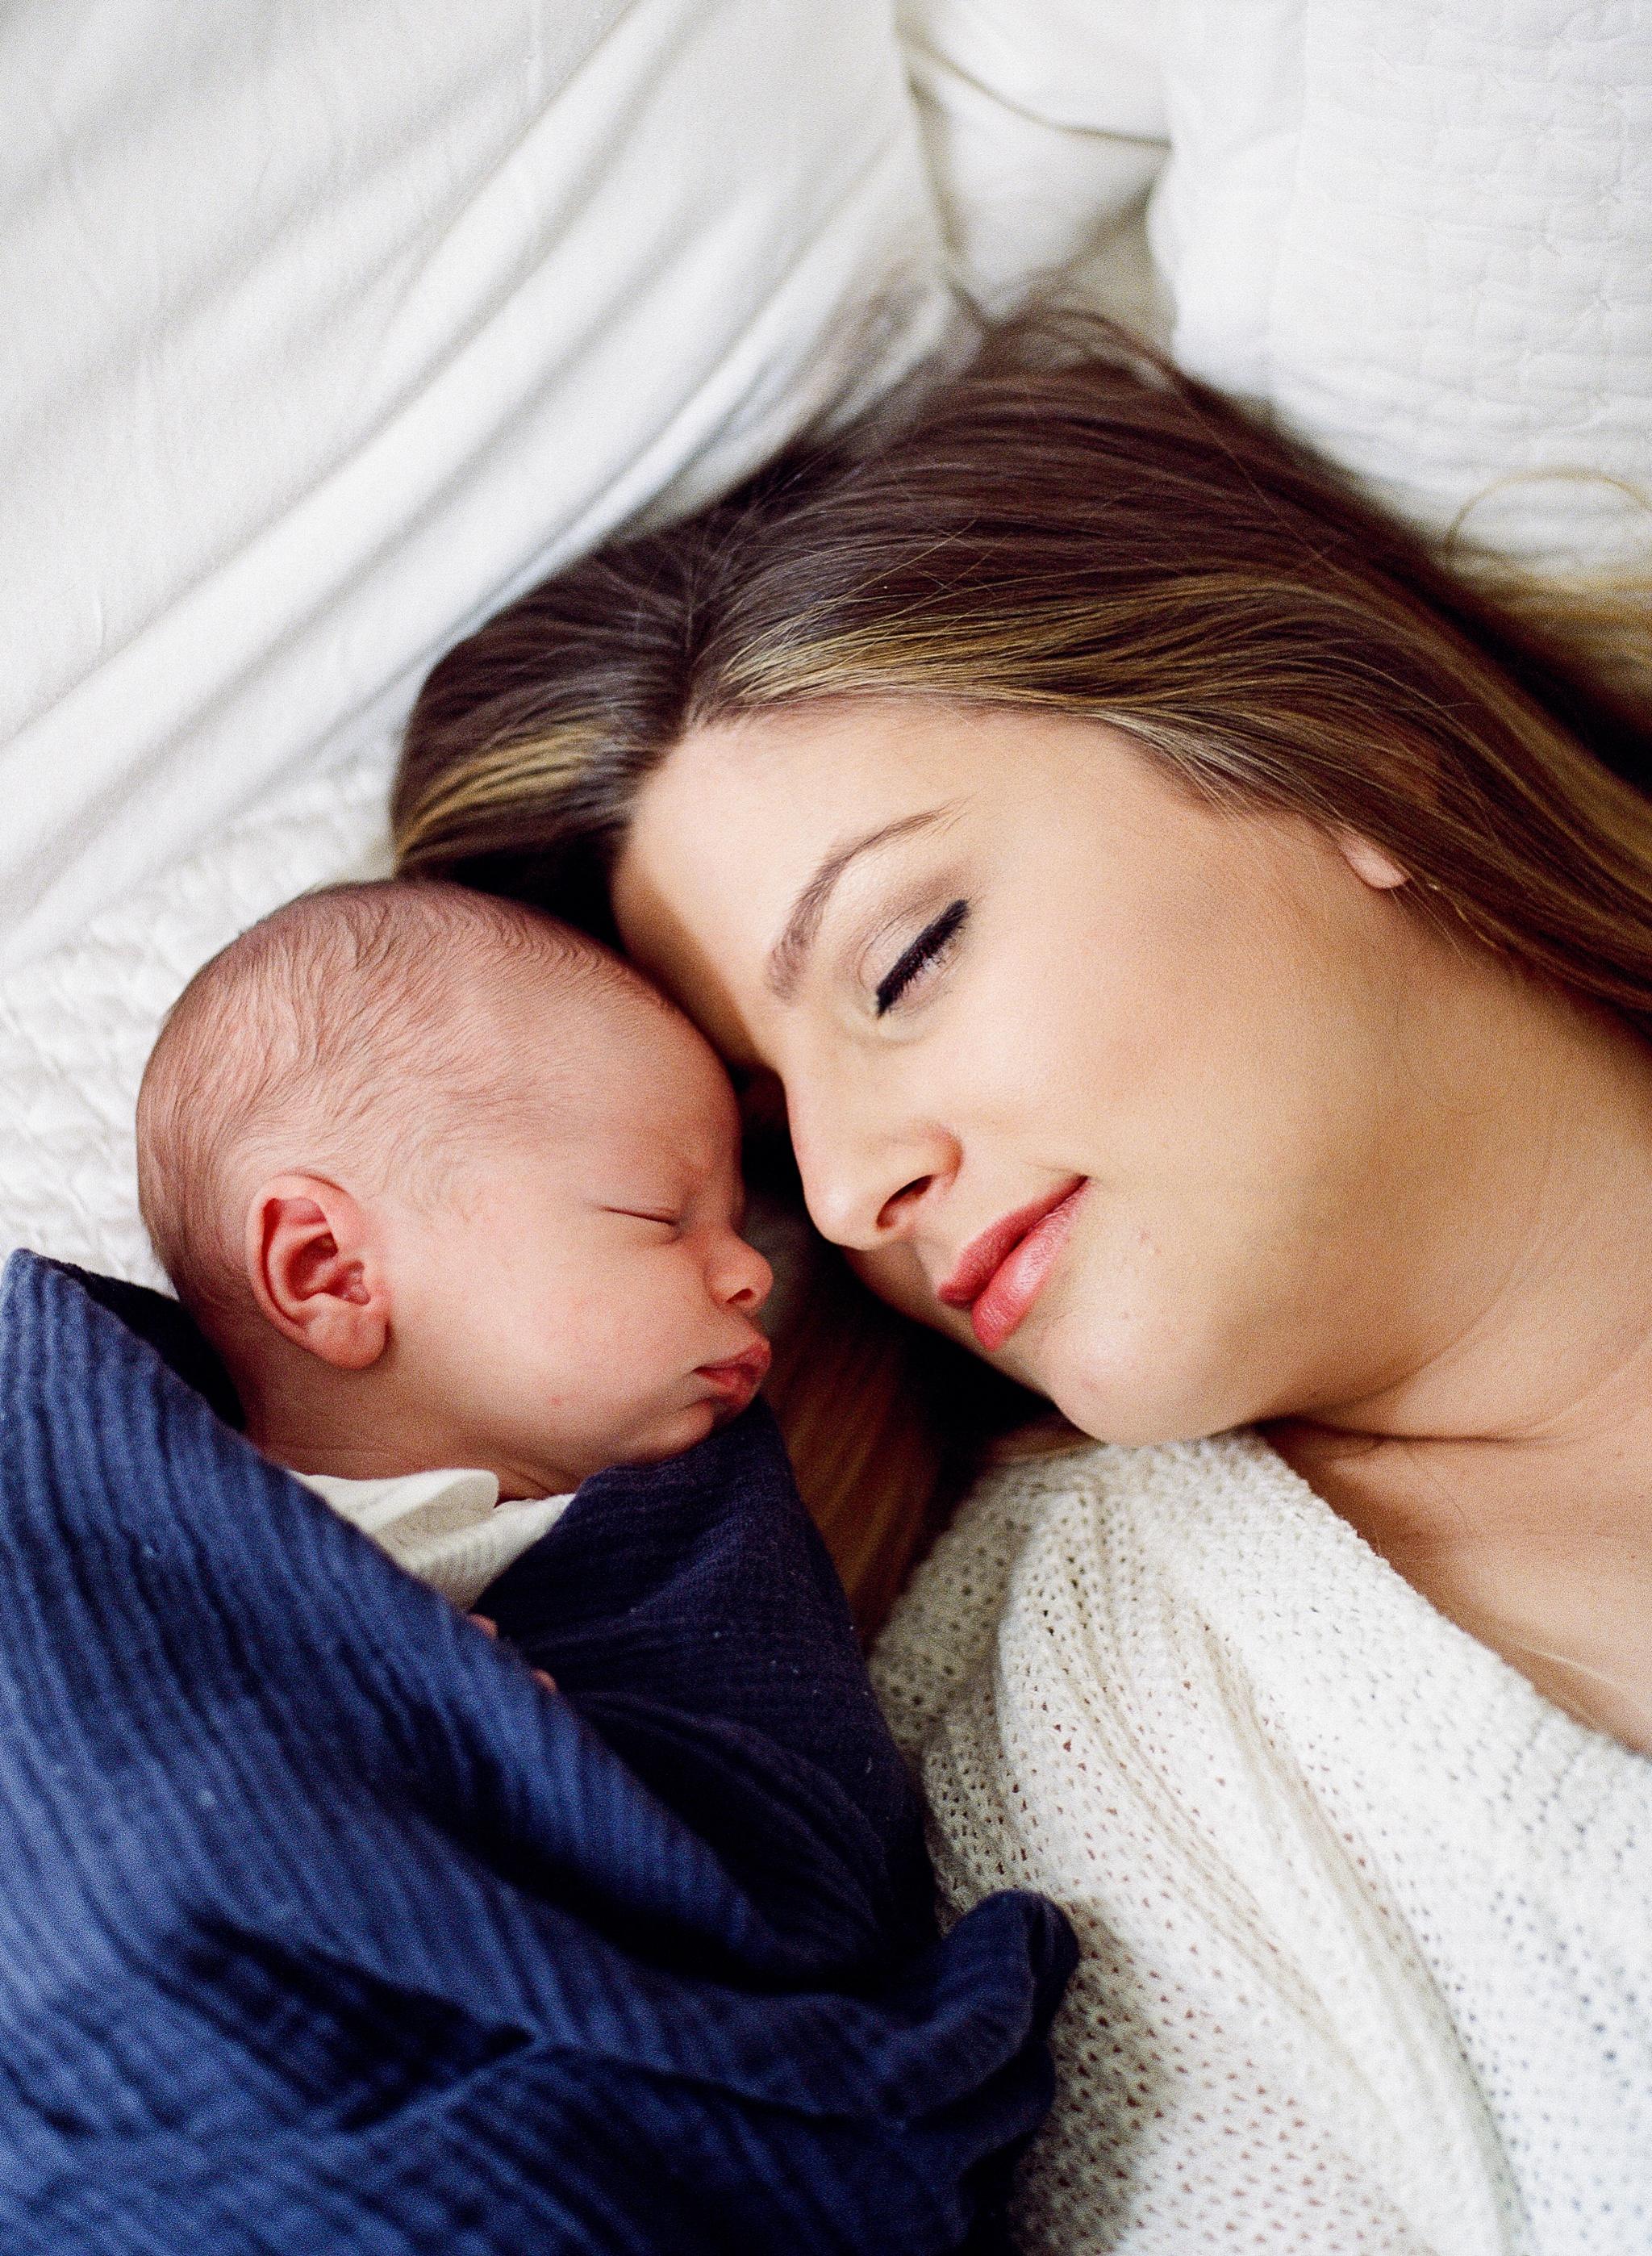 atlanta-georgia-fine-art-film-newborn-photographer-kaitlynne-grice-38.jpg